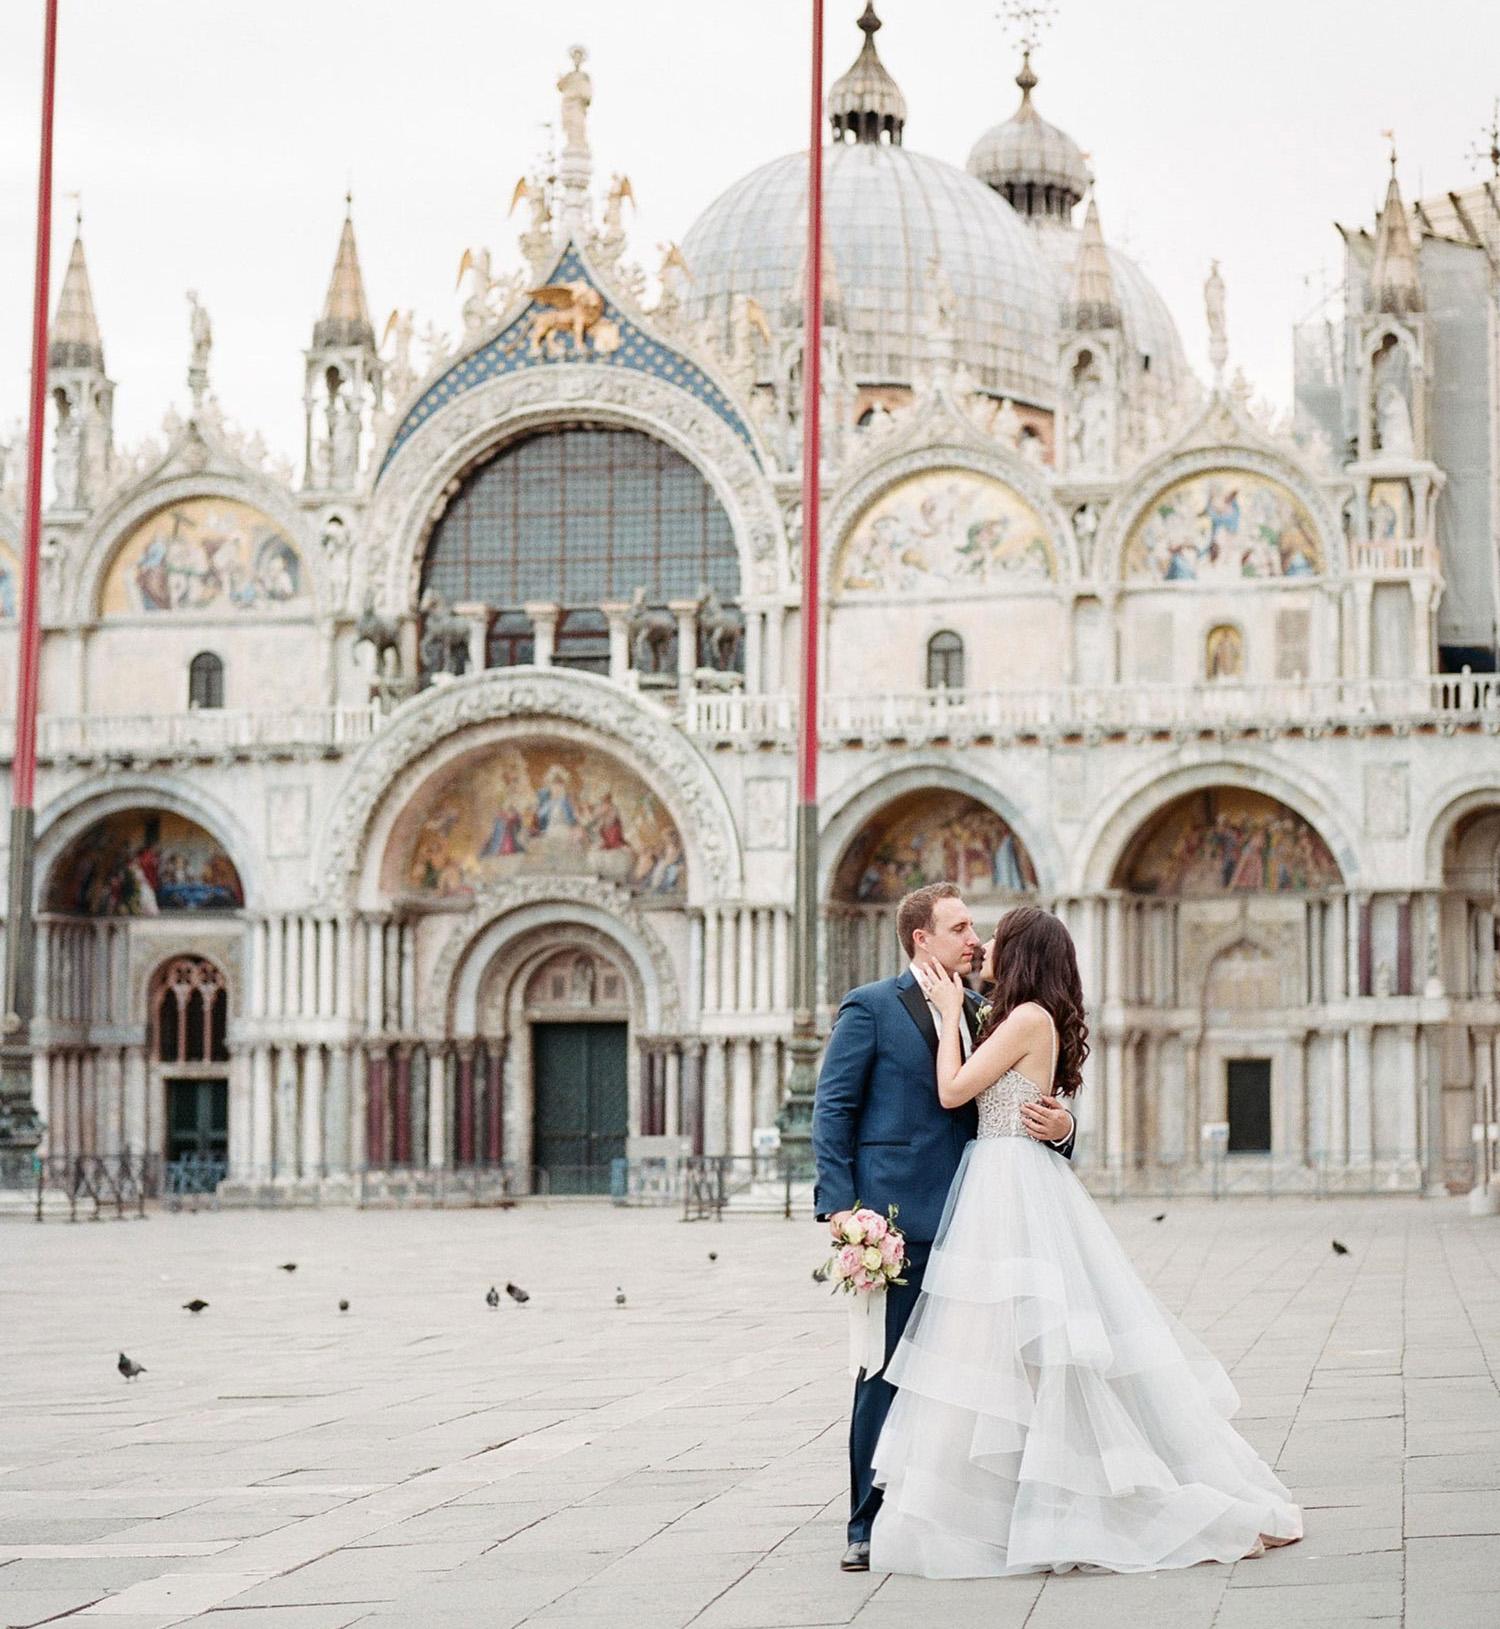 what to do when planning a destination wedding